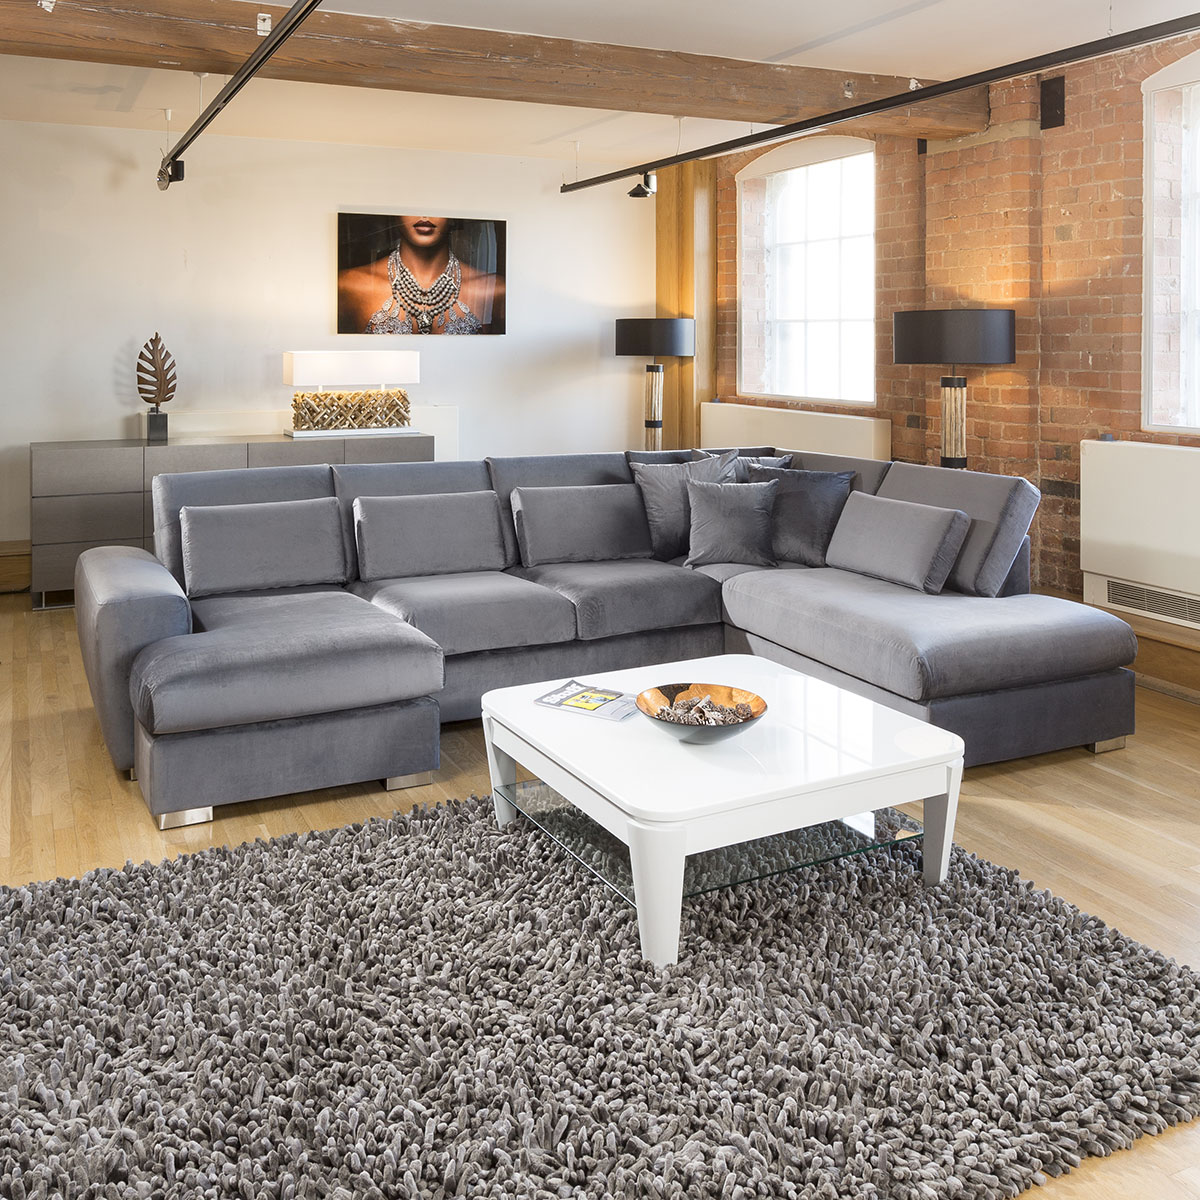 Large Corner Sofas Ebay Uk: Luxury Corner Sofa Velvet Quatropi Ohio Large 5 Seater L